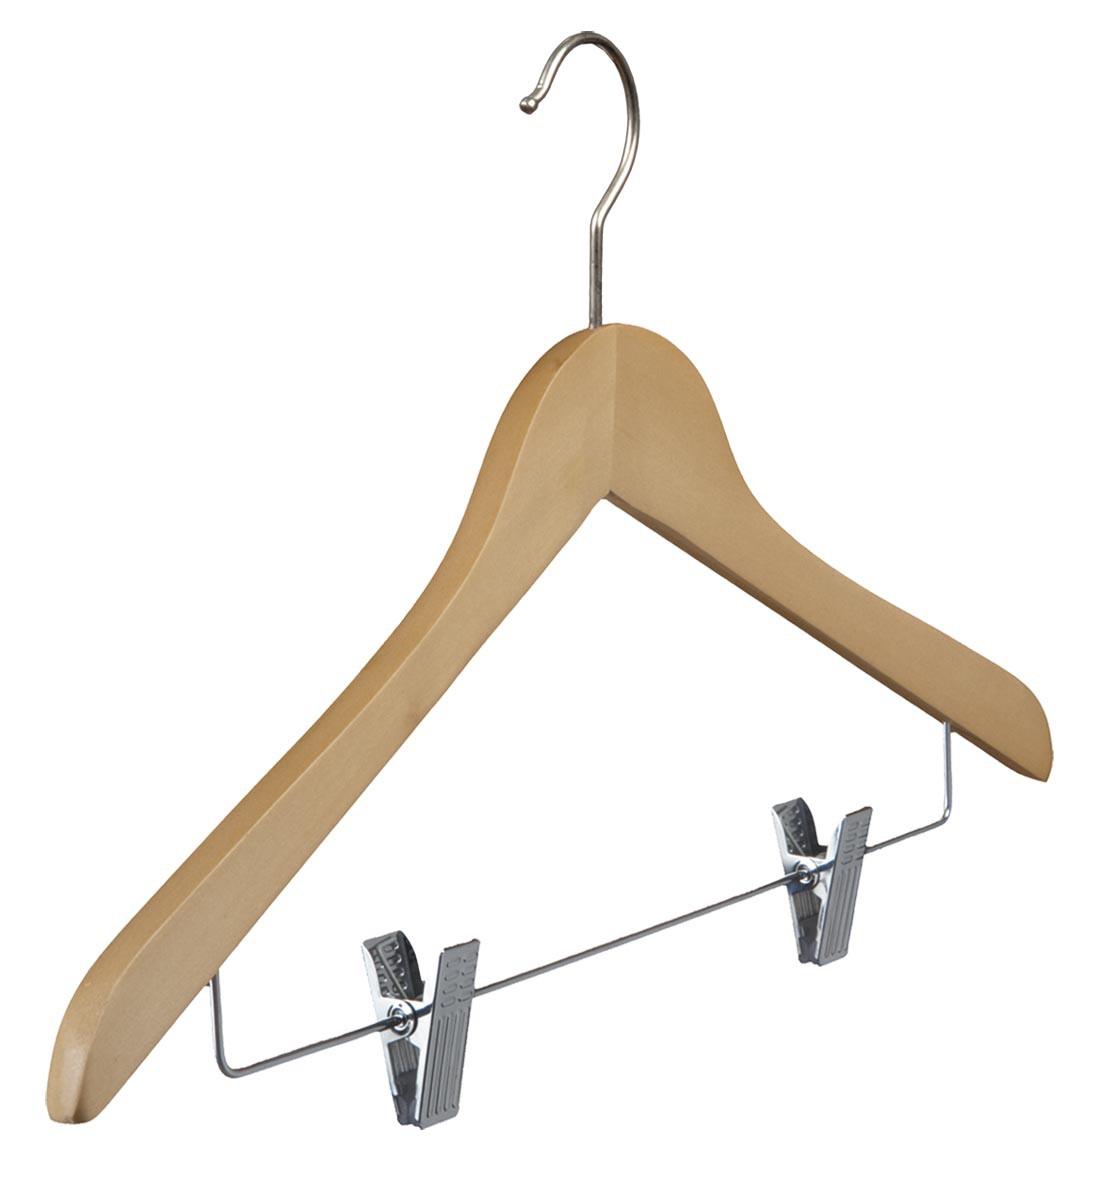 Lotusholz-Kleiderbügel mit Klammernsteg